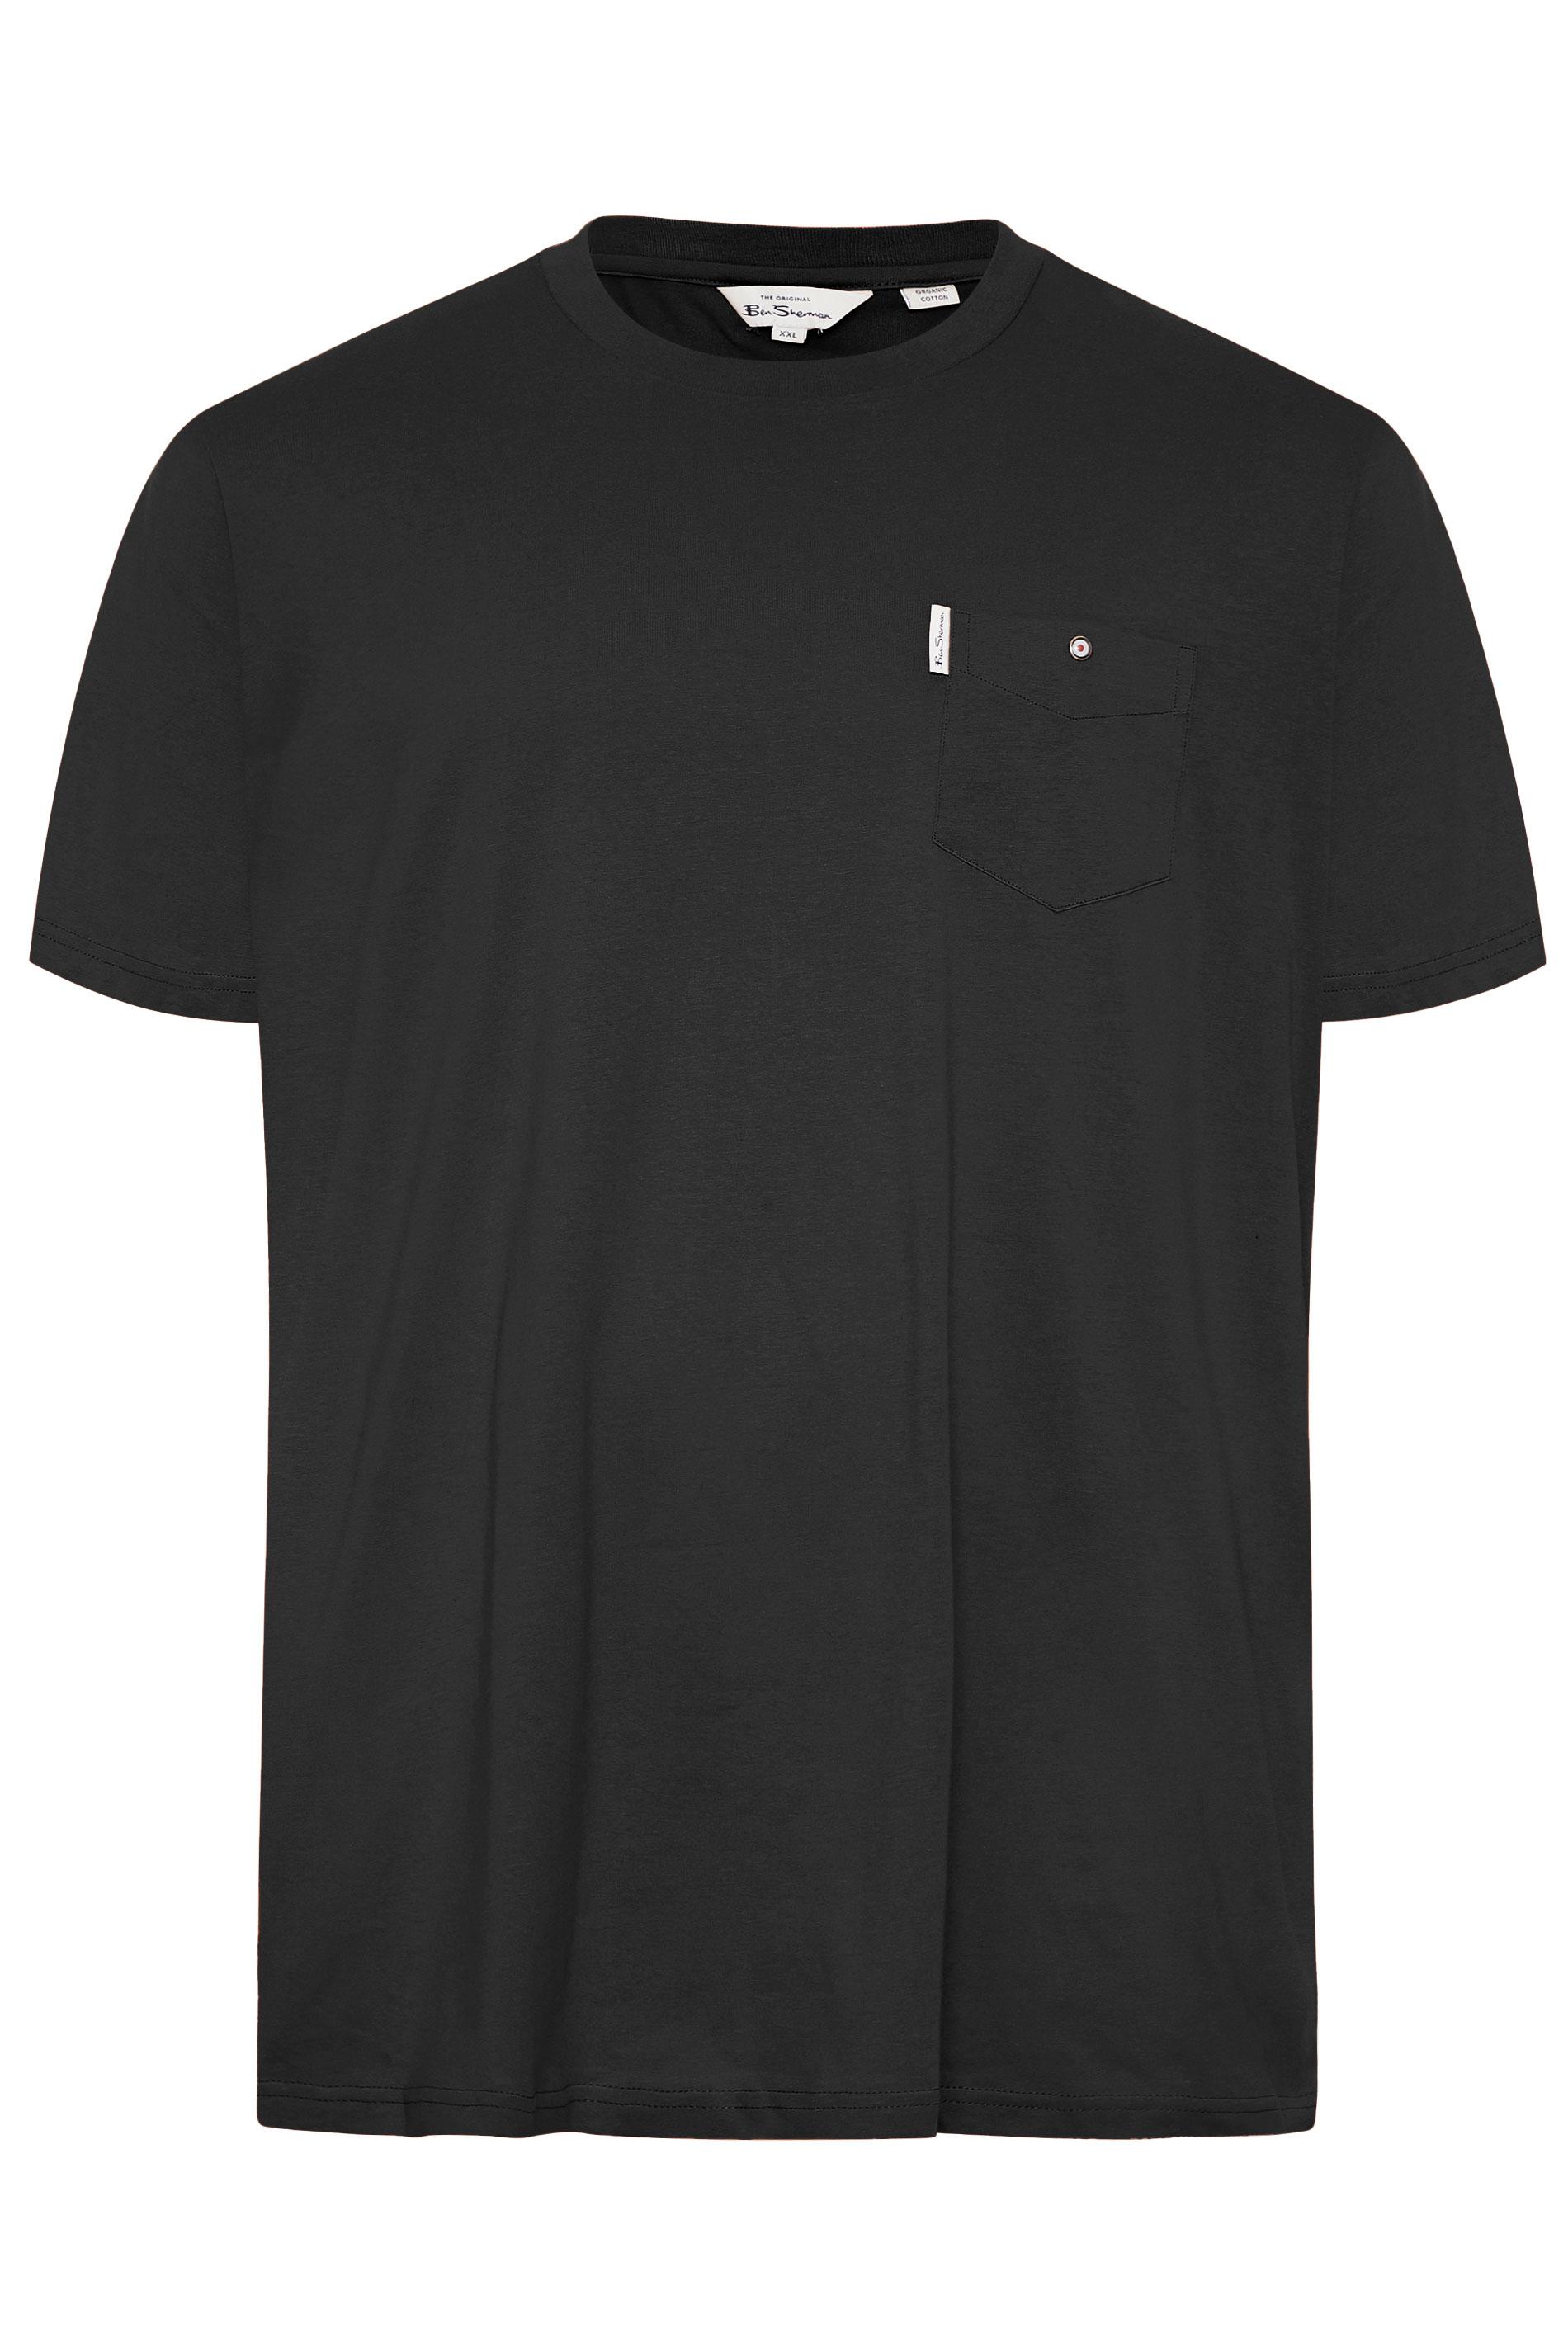 BEN SHERMAN Black Pocket T-Shirt_F.jpg